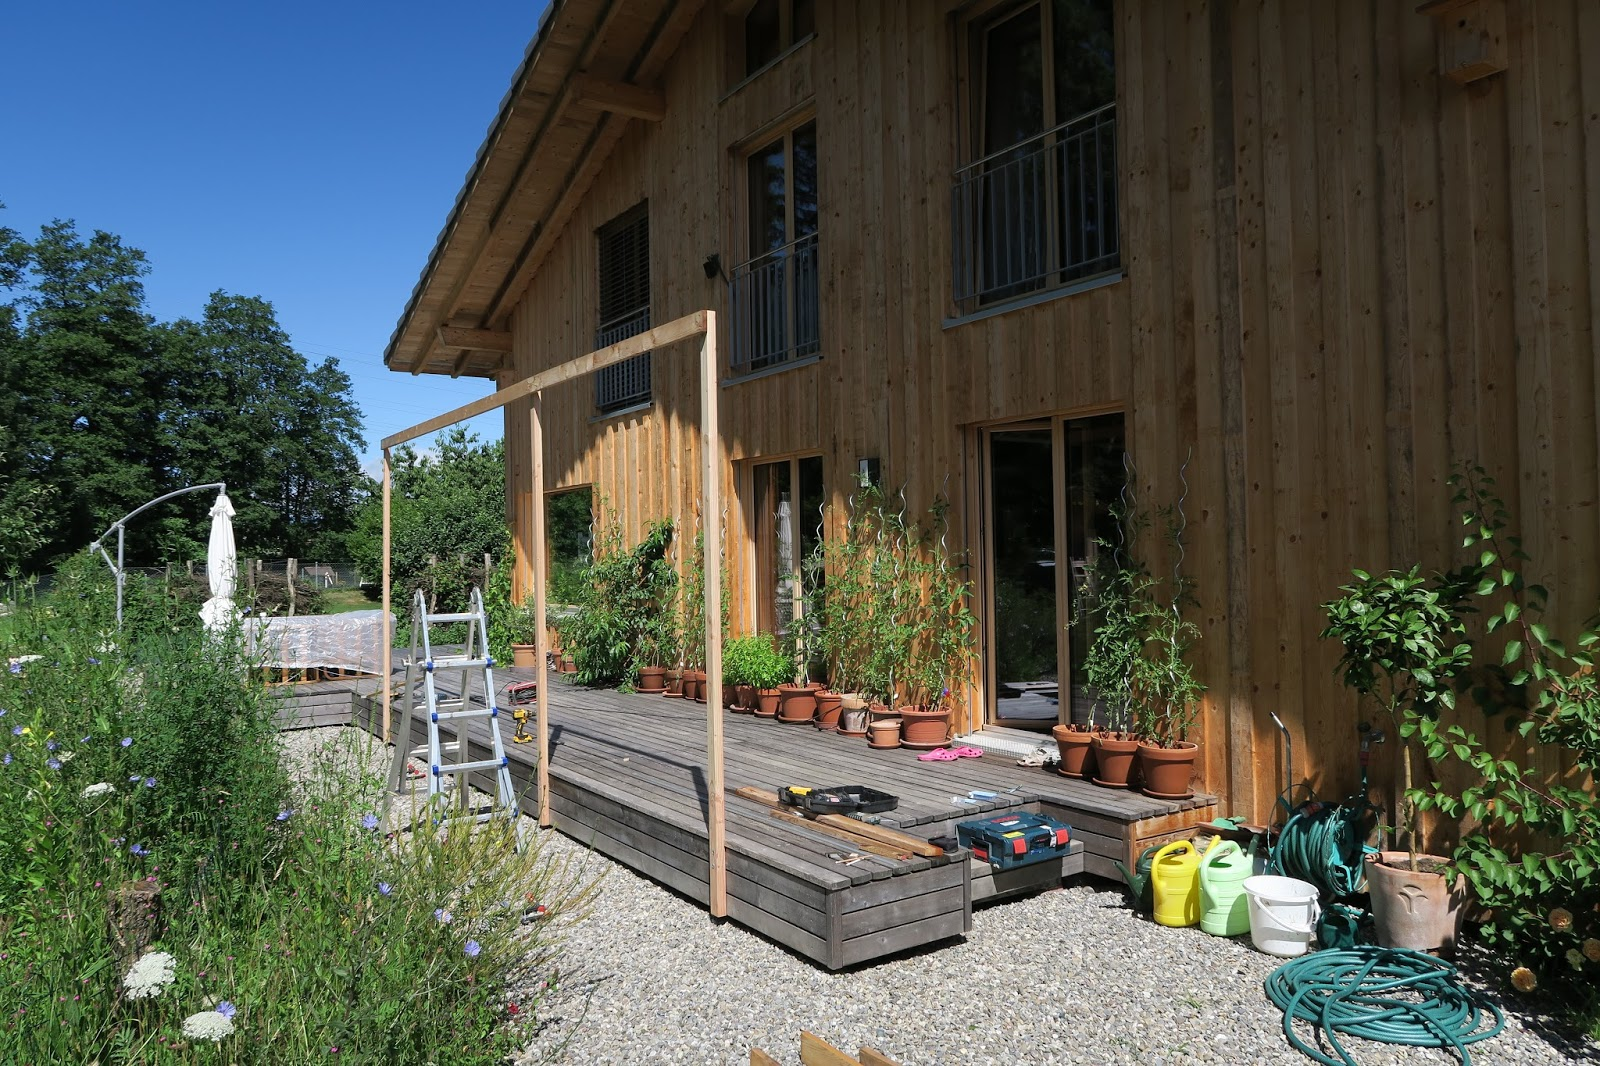 veranda selber bauen. gartenhaus veranda selber bauen hauptdesign